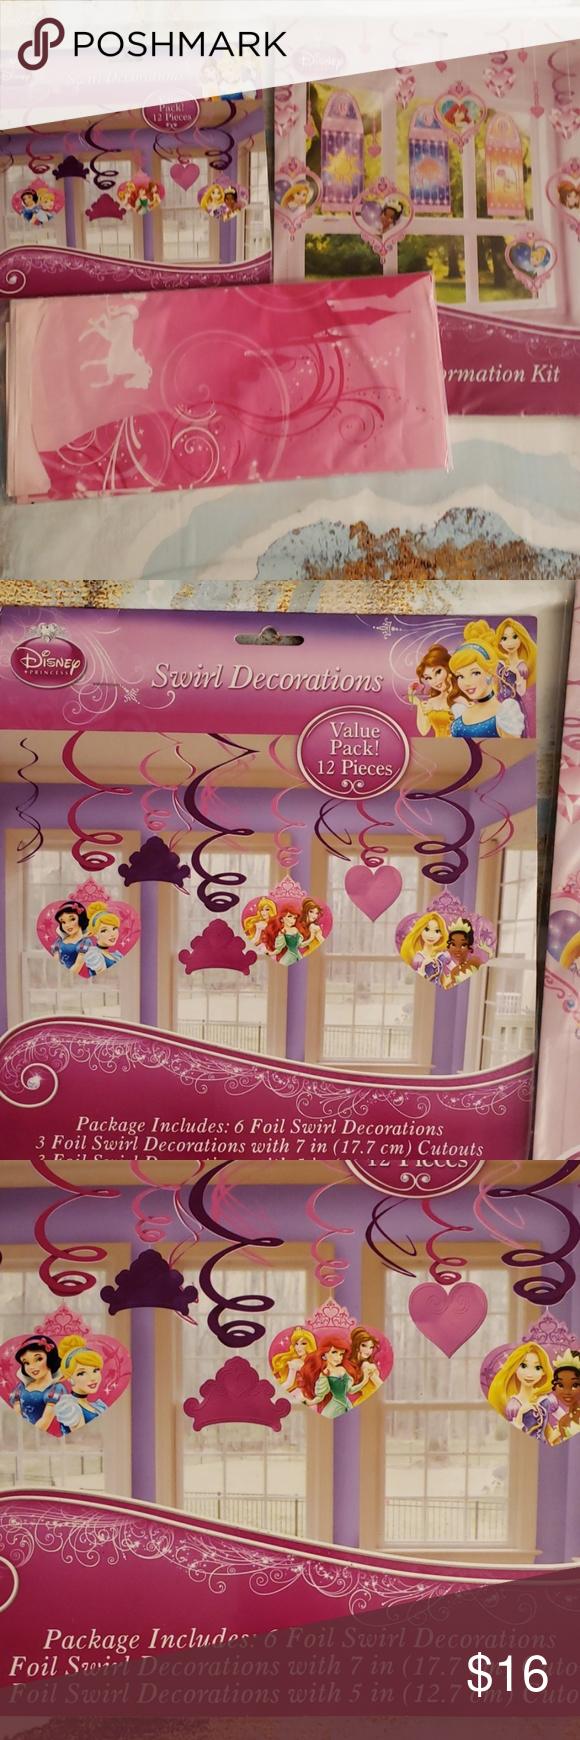 4 Pc Disney Princess Party Decorations Princess Party Decorations Disney Princess Party Disney Princess Party Decorations